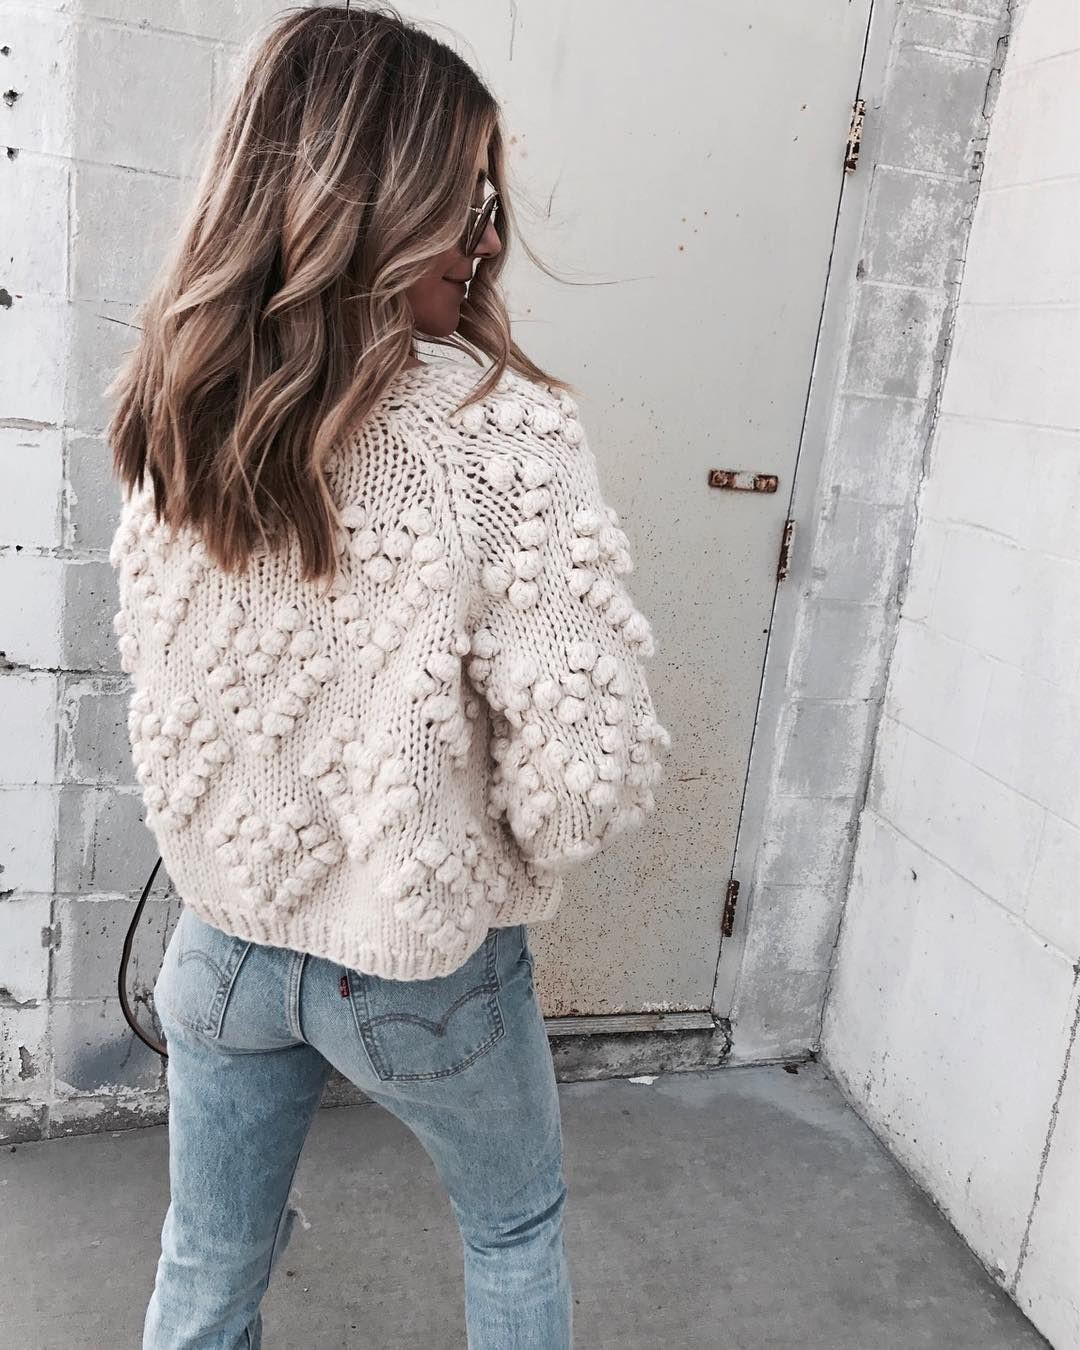 Colour dress white sweater instagram, polar fleece, casual wear, polo neck, t shirt